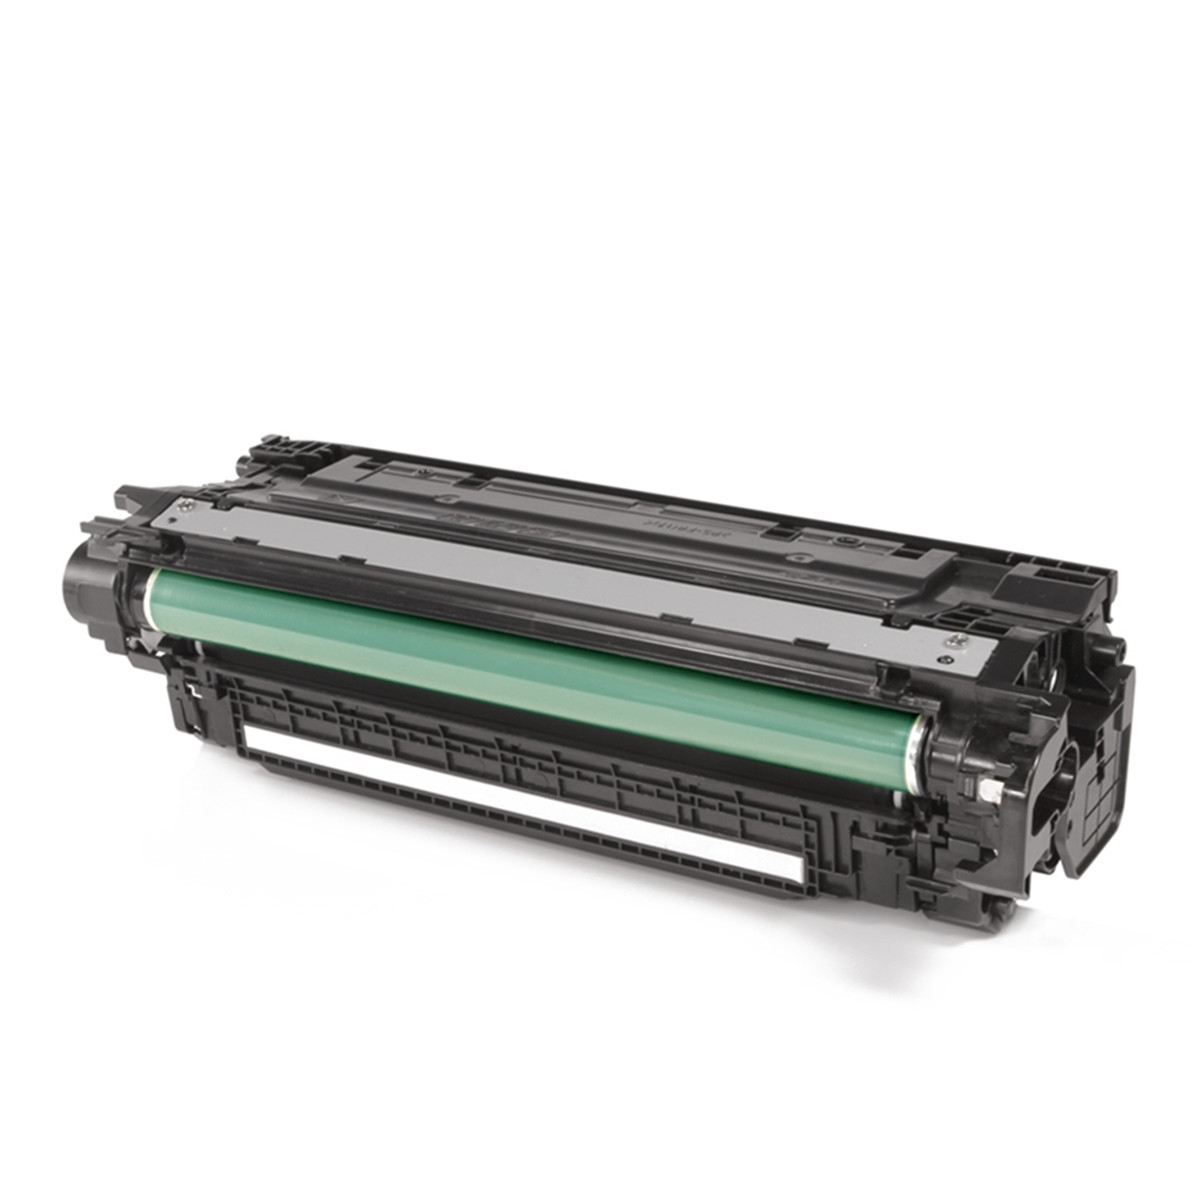 Toner Compatível com HP CE400X Preto | M575 M570 M575DN M575F M575C M570DN M570DW | Importado 10.5k